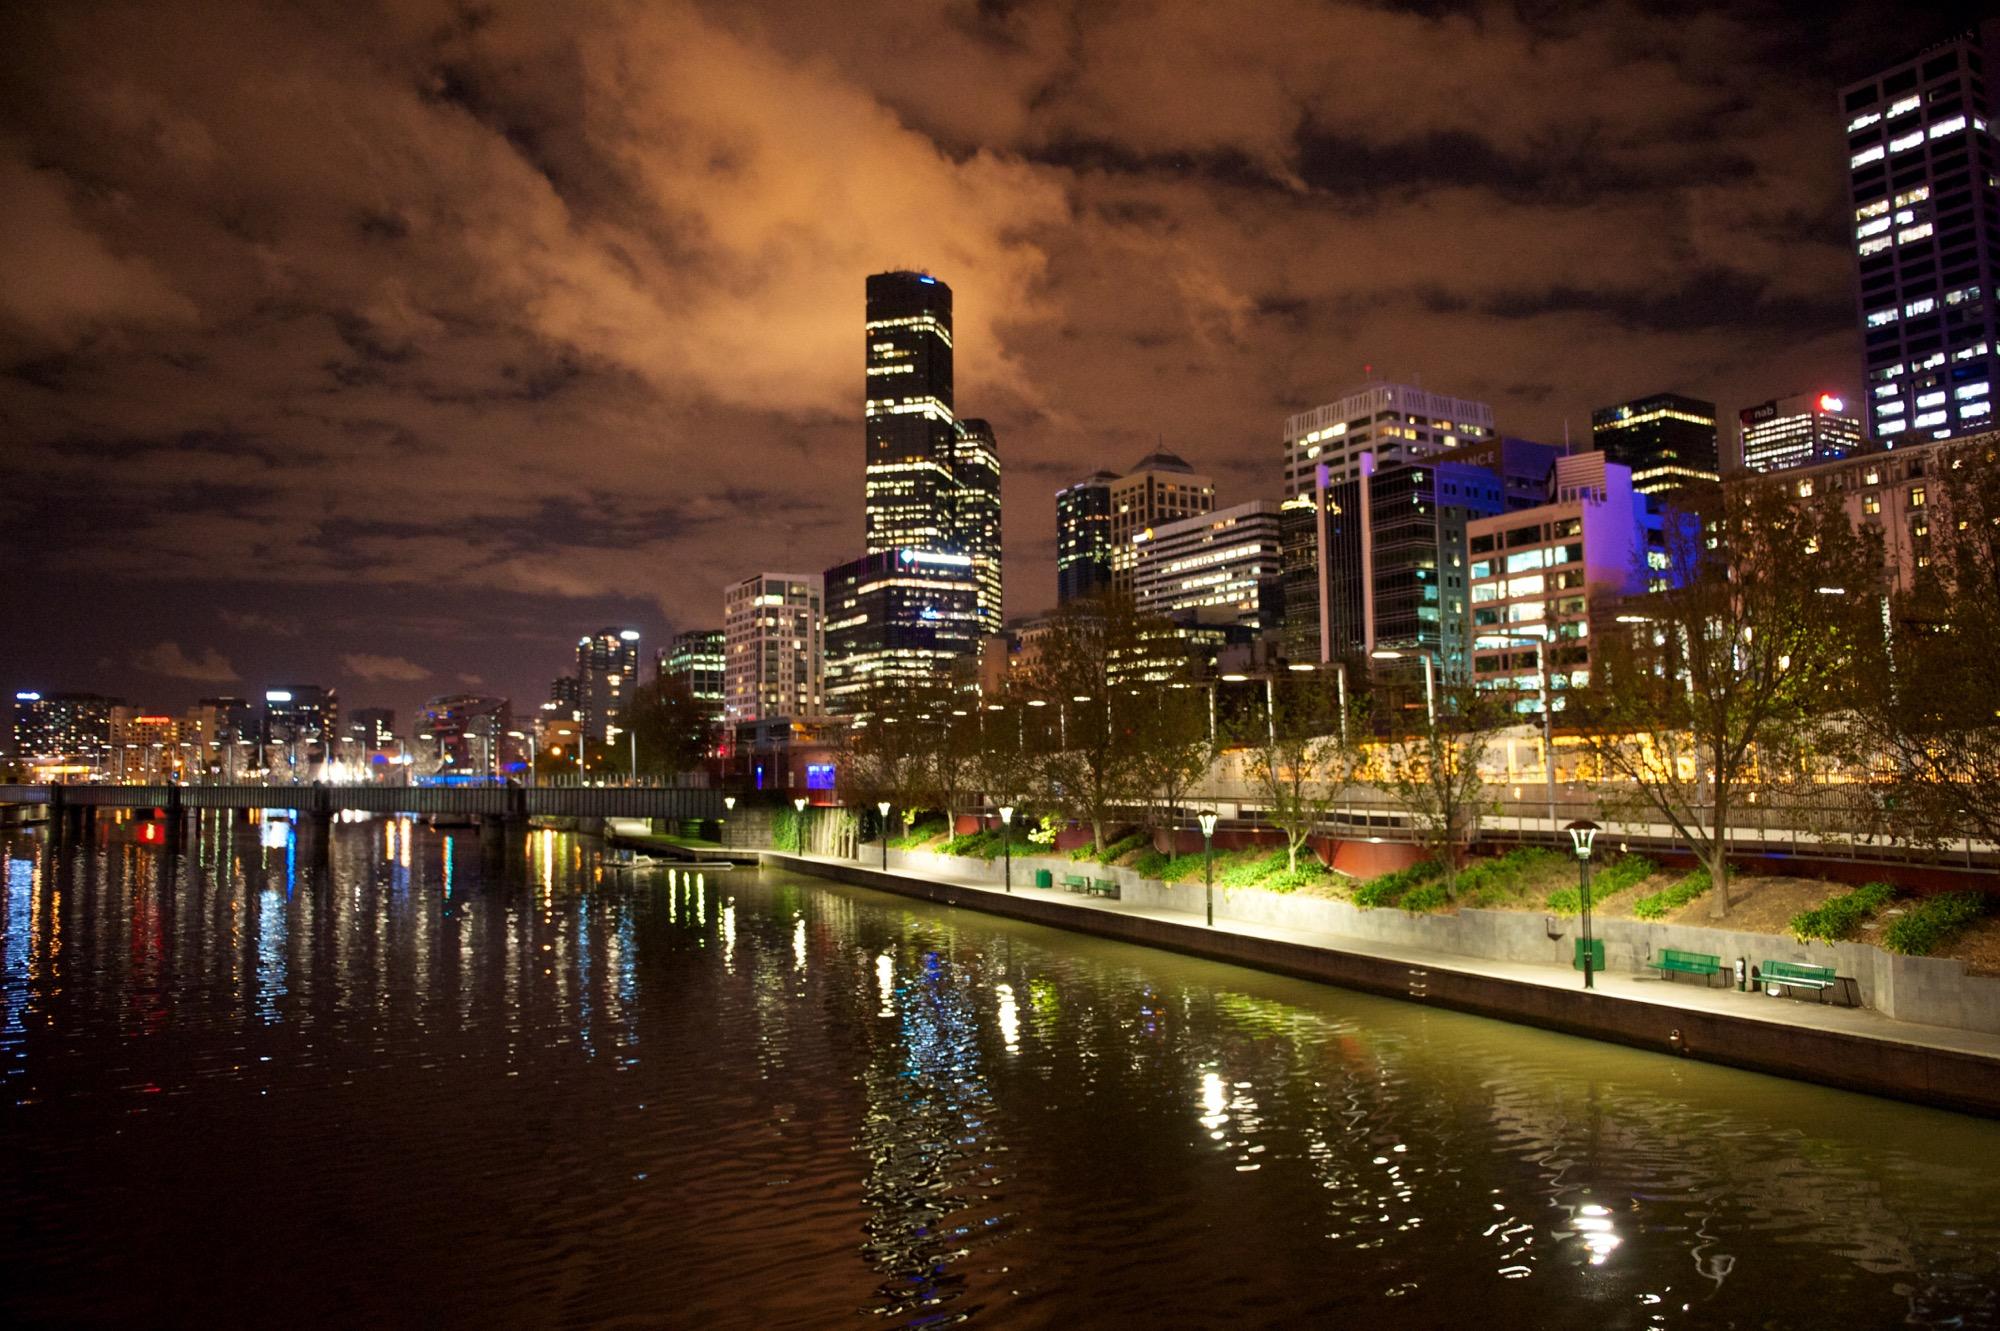 Melbourne stuff - 1 of 223 (171).jpg